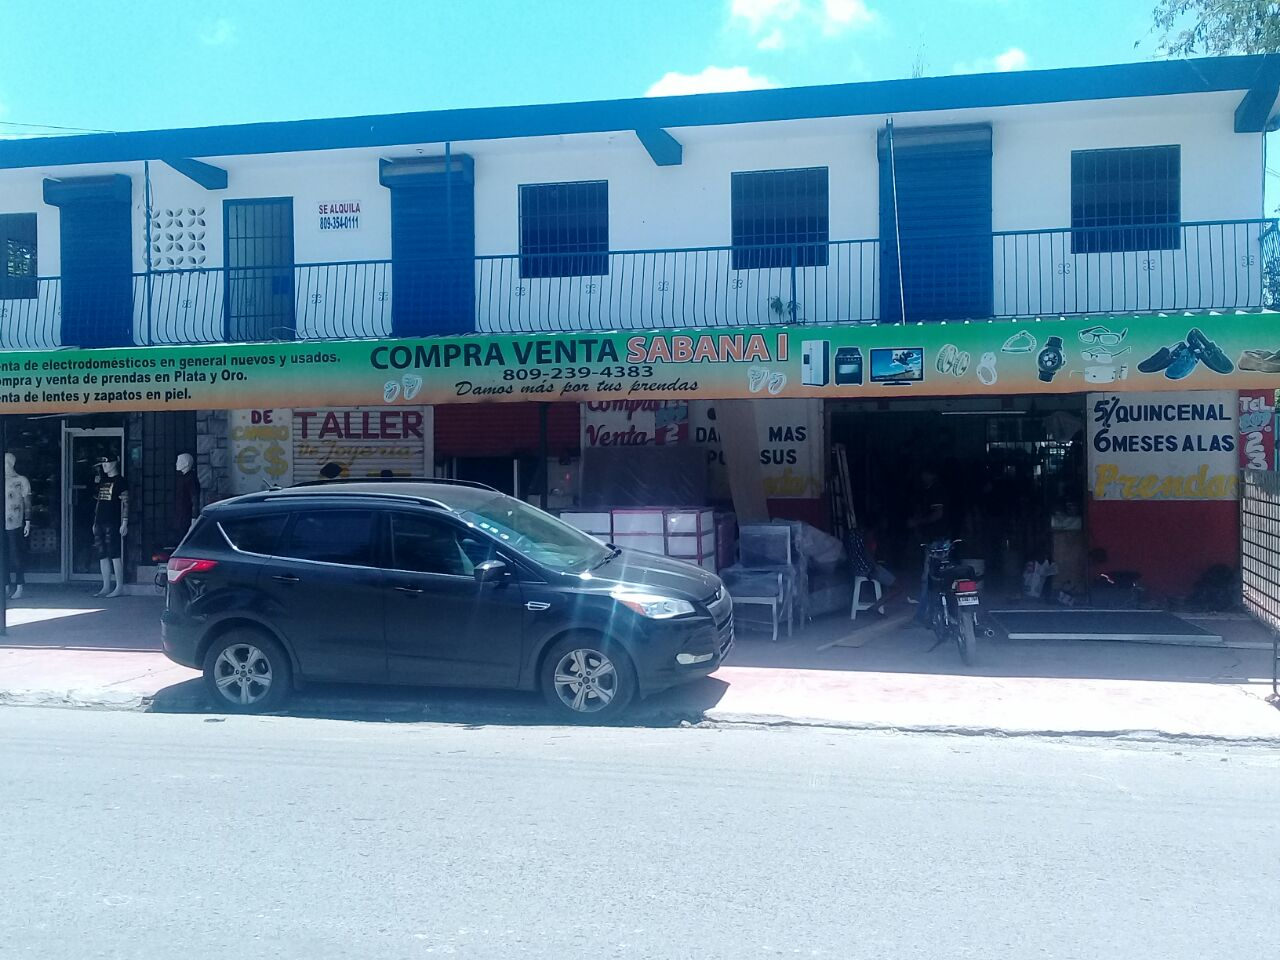 A prisión dos hombres acusados de robo en compraventa en Sabana Perdida